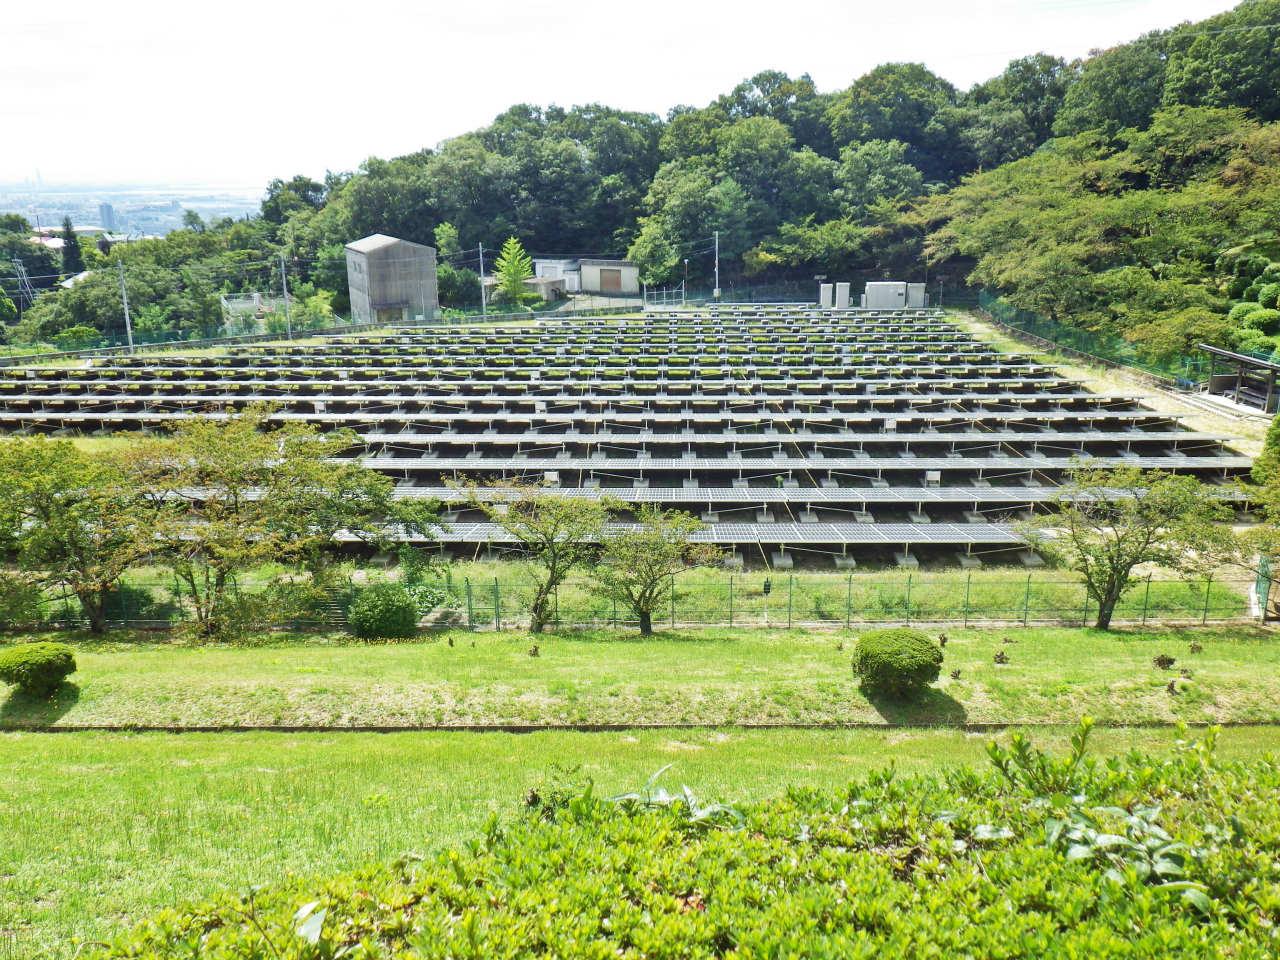 10b ソーラーパネル